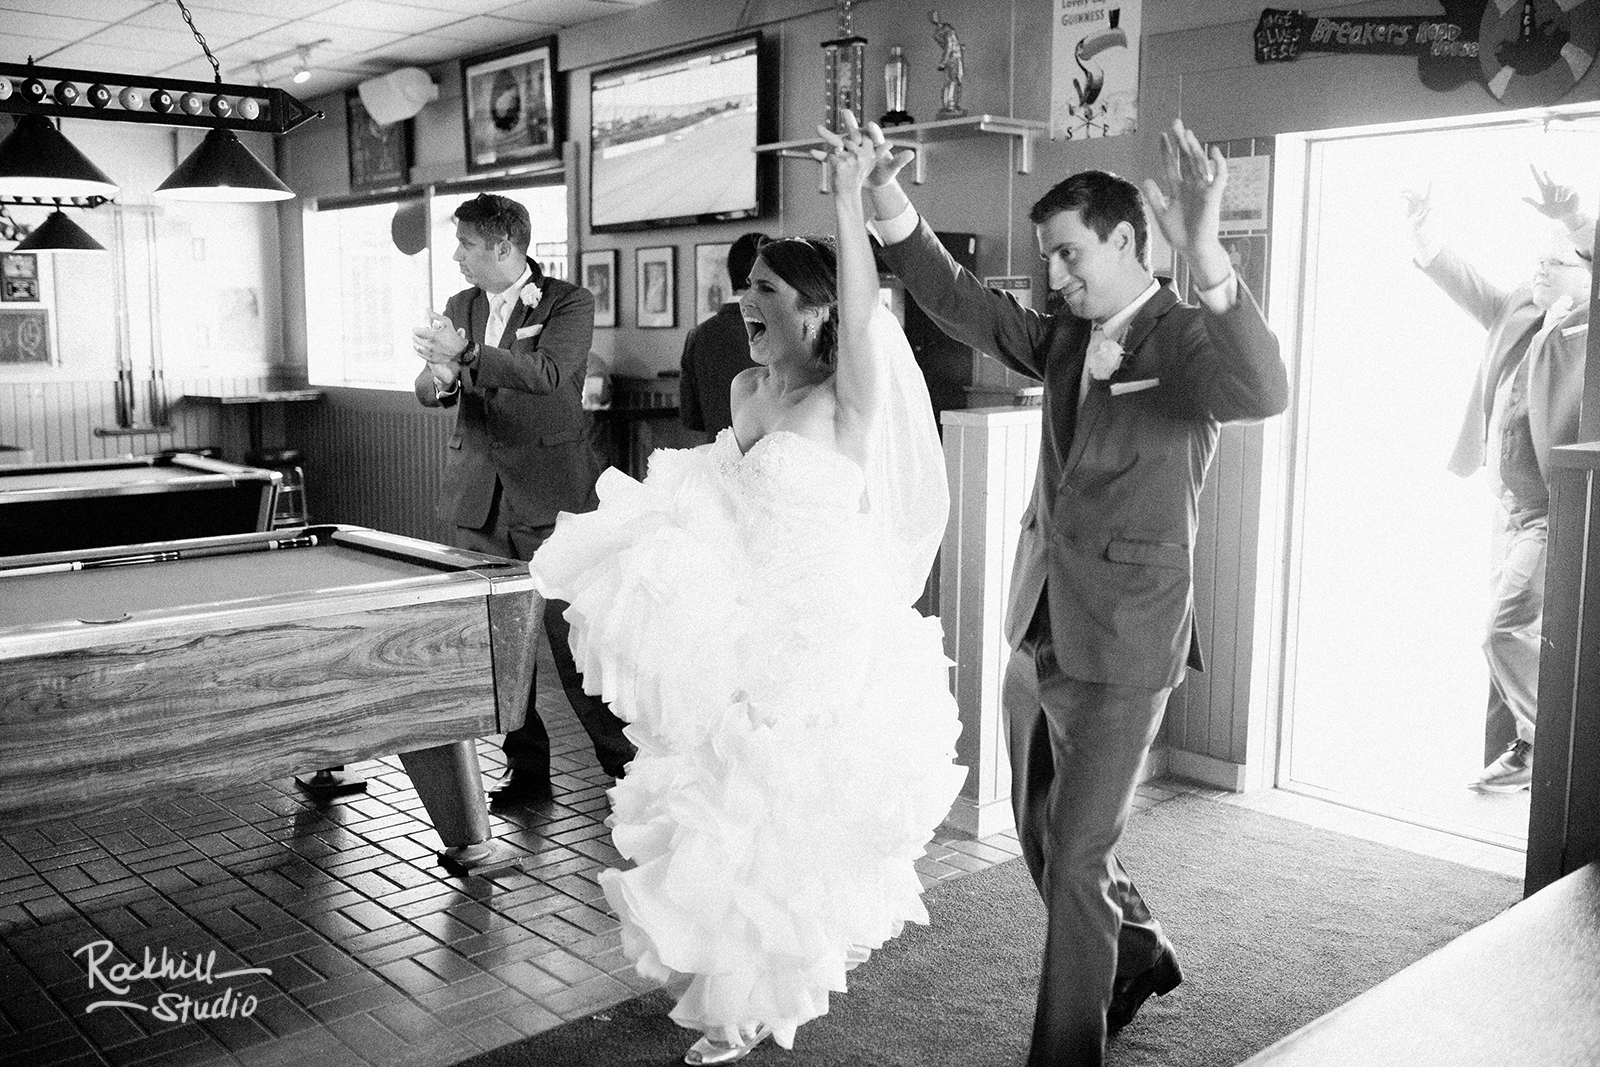 marquette-wedding-upper-peninsula-northern-michigan-wedding-ck-photography-bridegroom-1.jpg